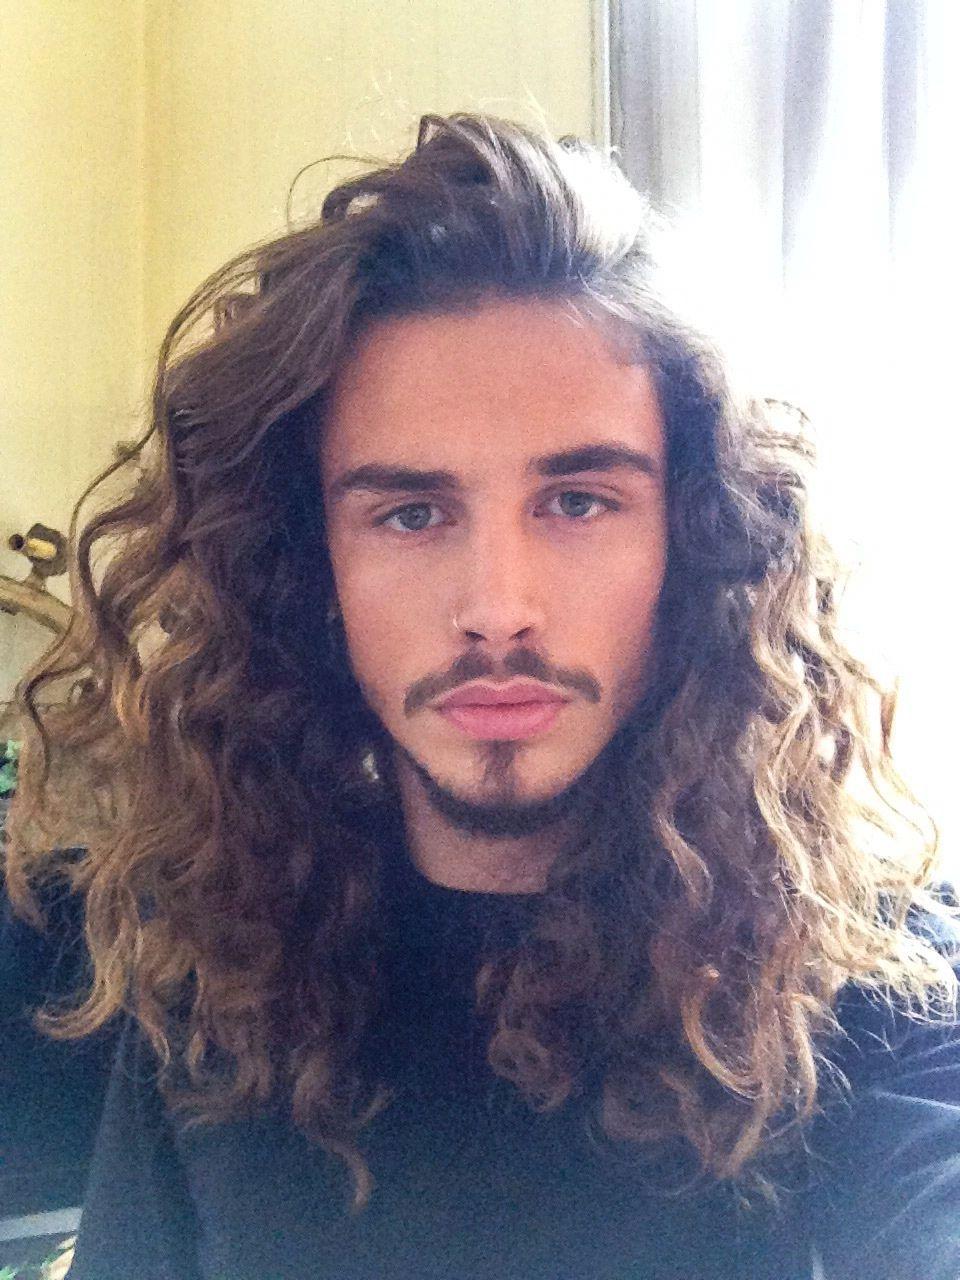 Mister Y Infinite Possibilities Hair Styles Long Hair Styles Men Curly Hair Styles